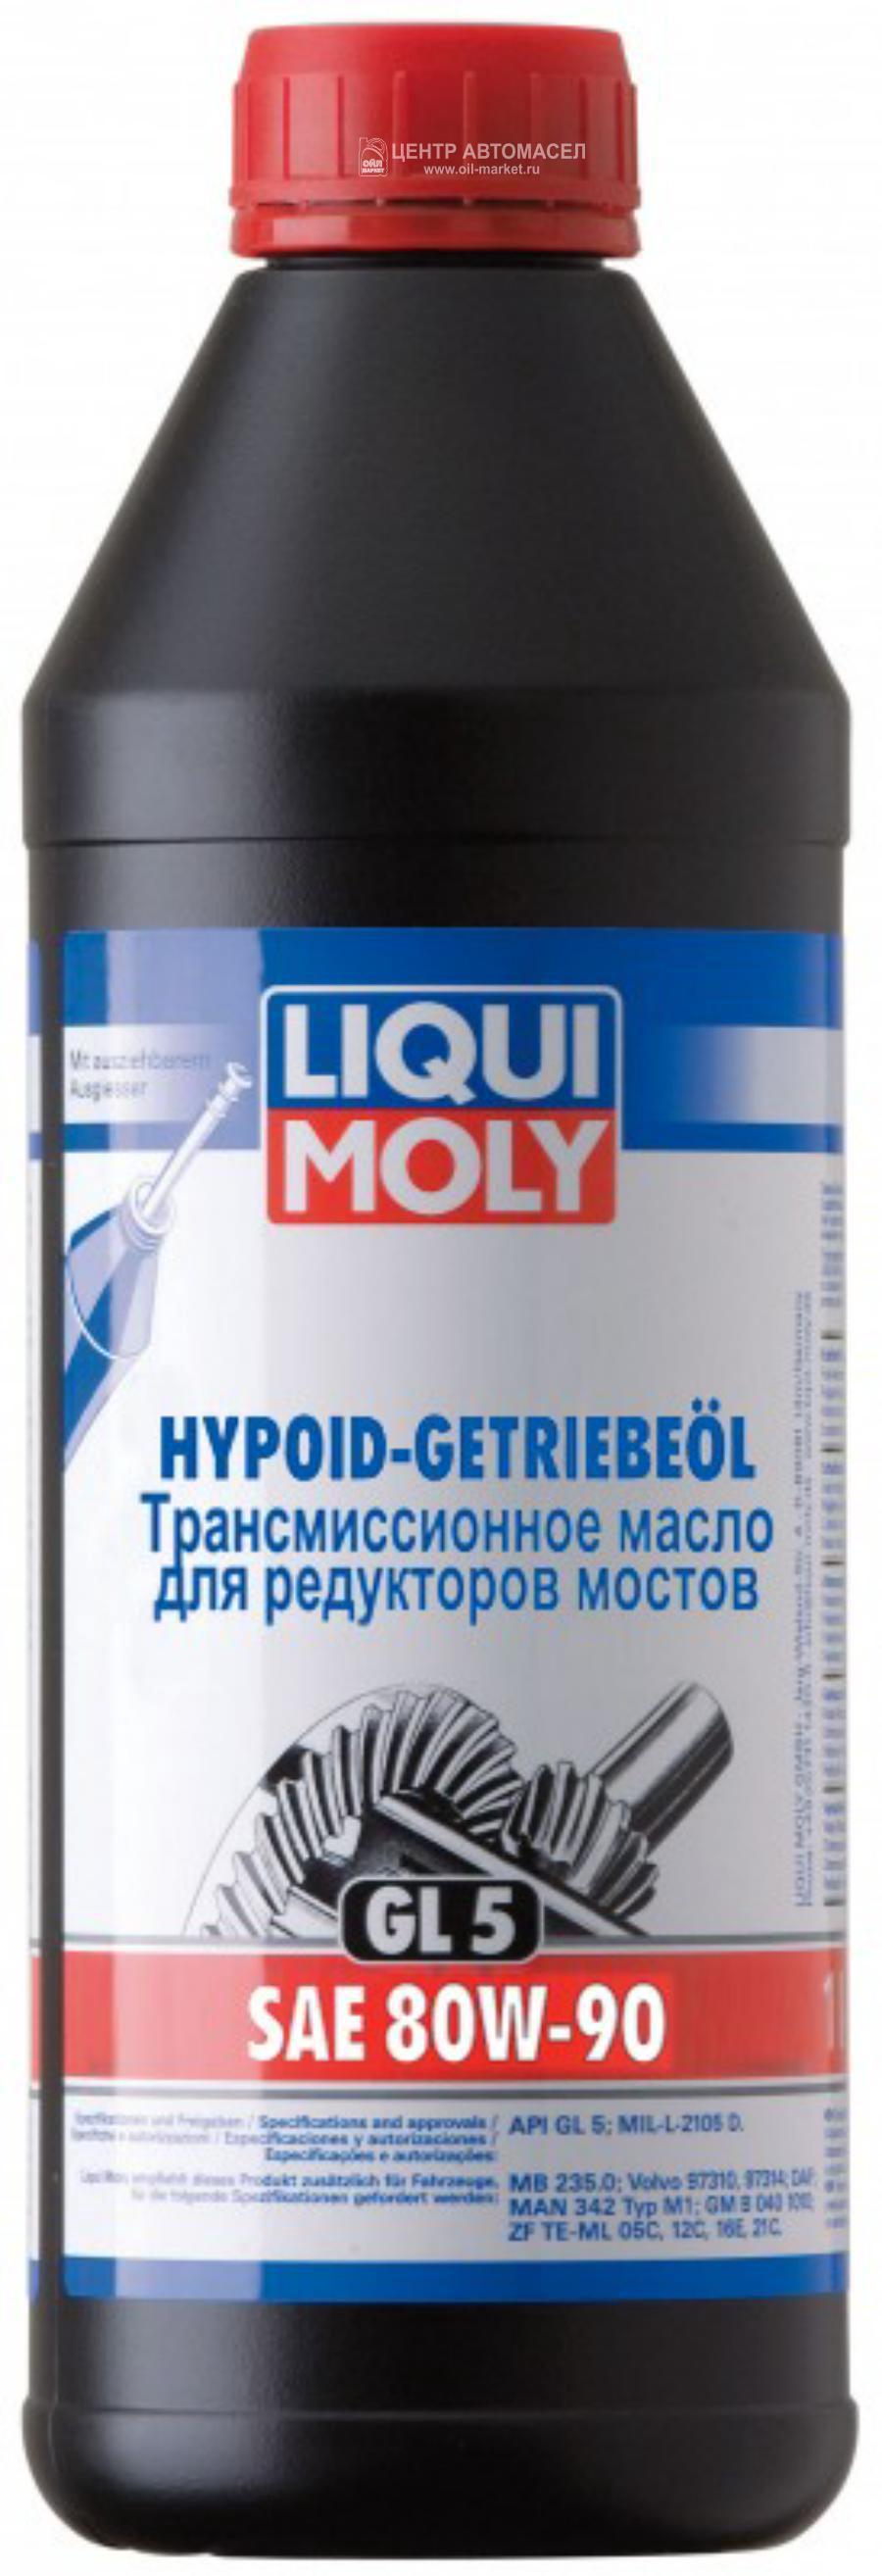 80W-90 GL5 HYP. 1л (мин.транс.масло)